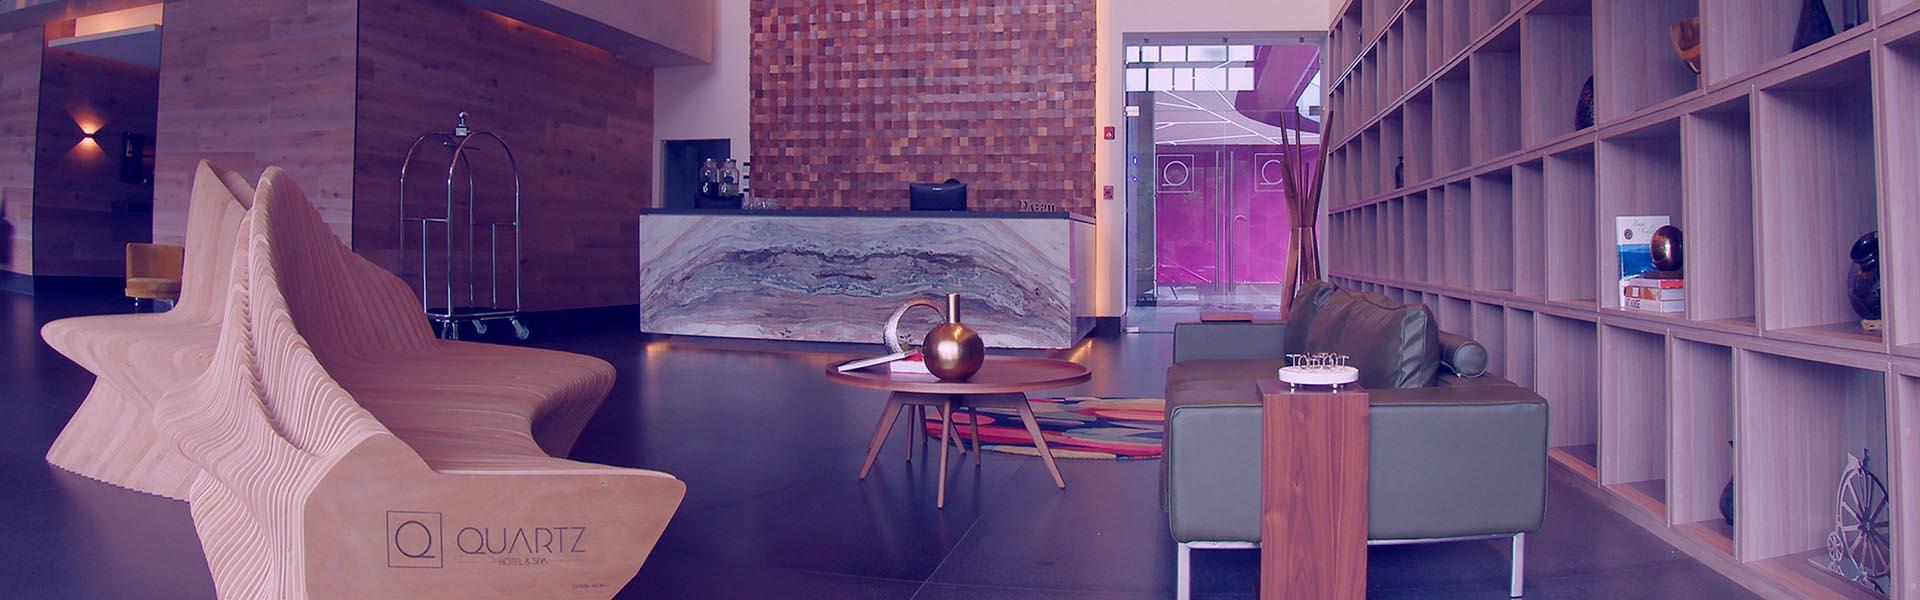 Quartz Hotel and Spa